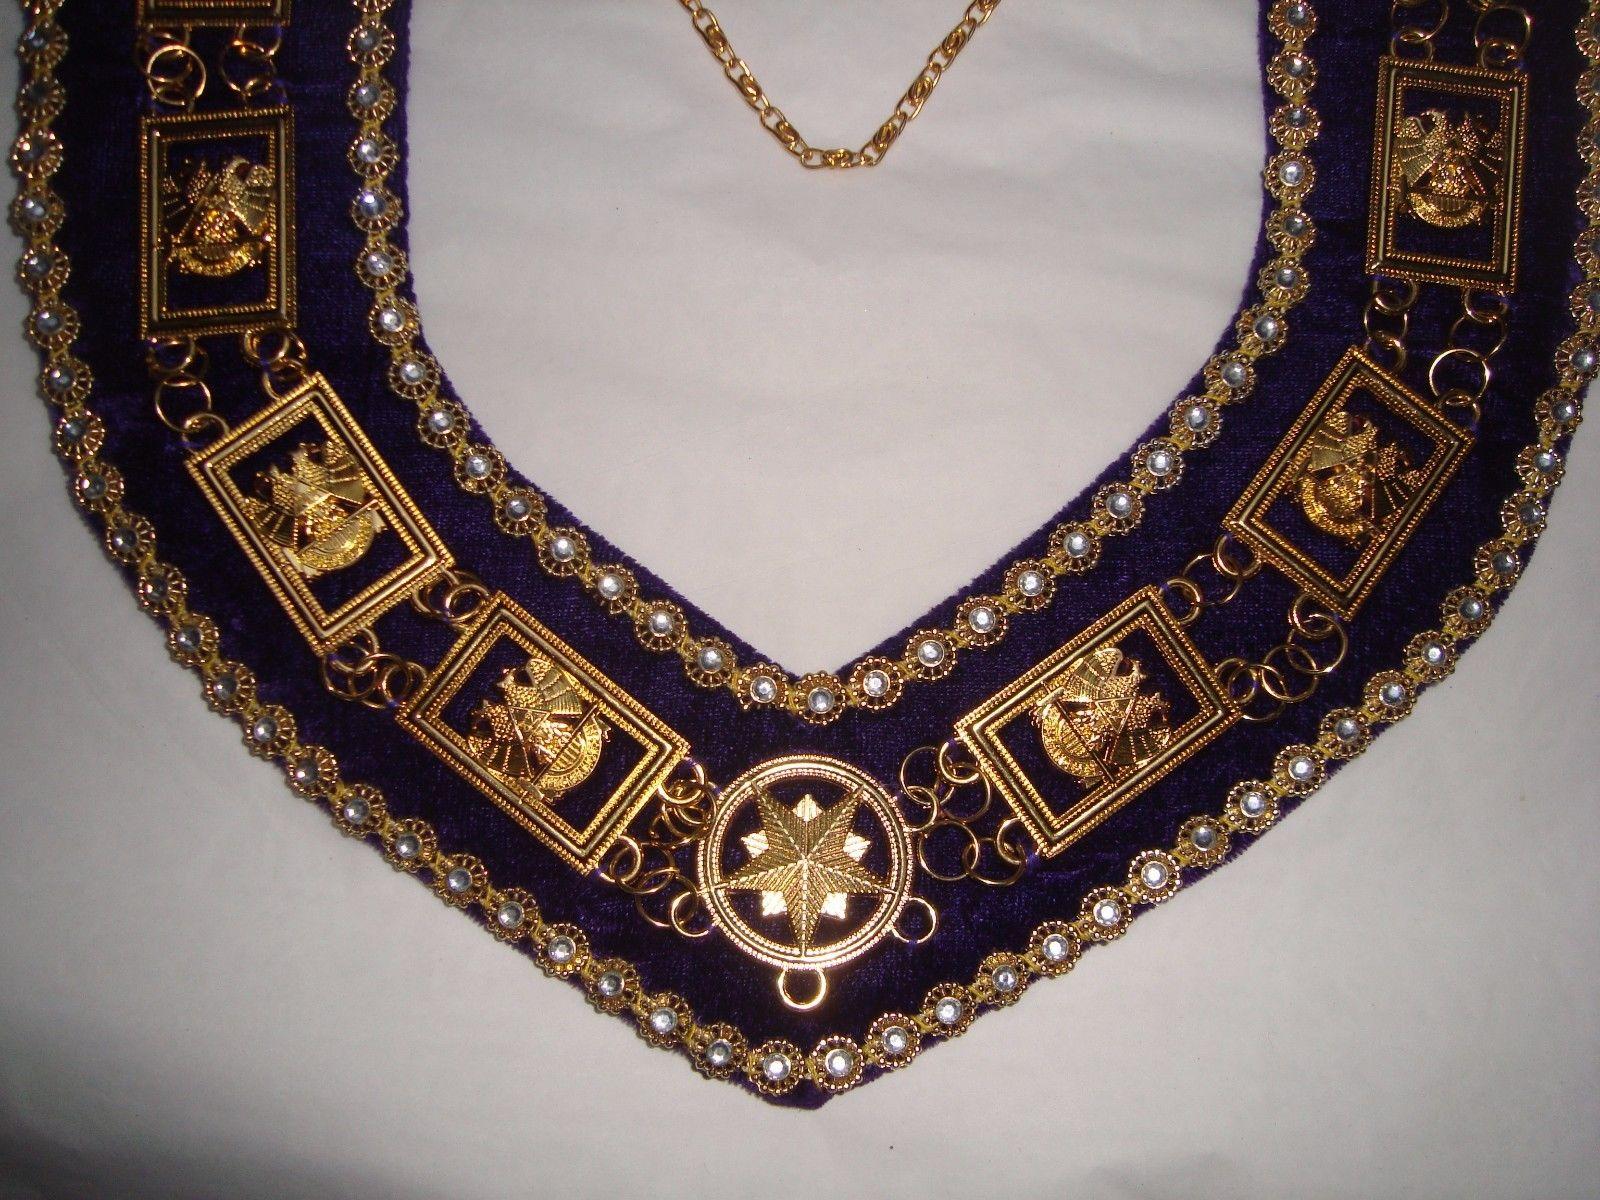 Masonic-Regalia-32-Degree-Scottish-Rite-Metal-Chain-_57 (1)